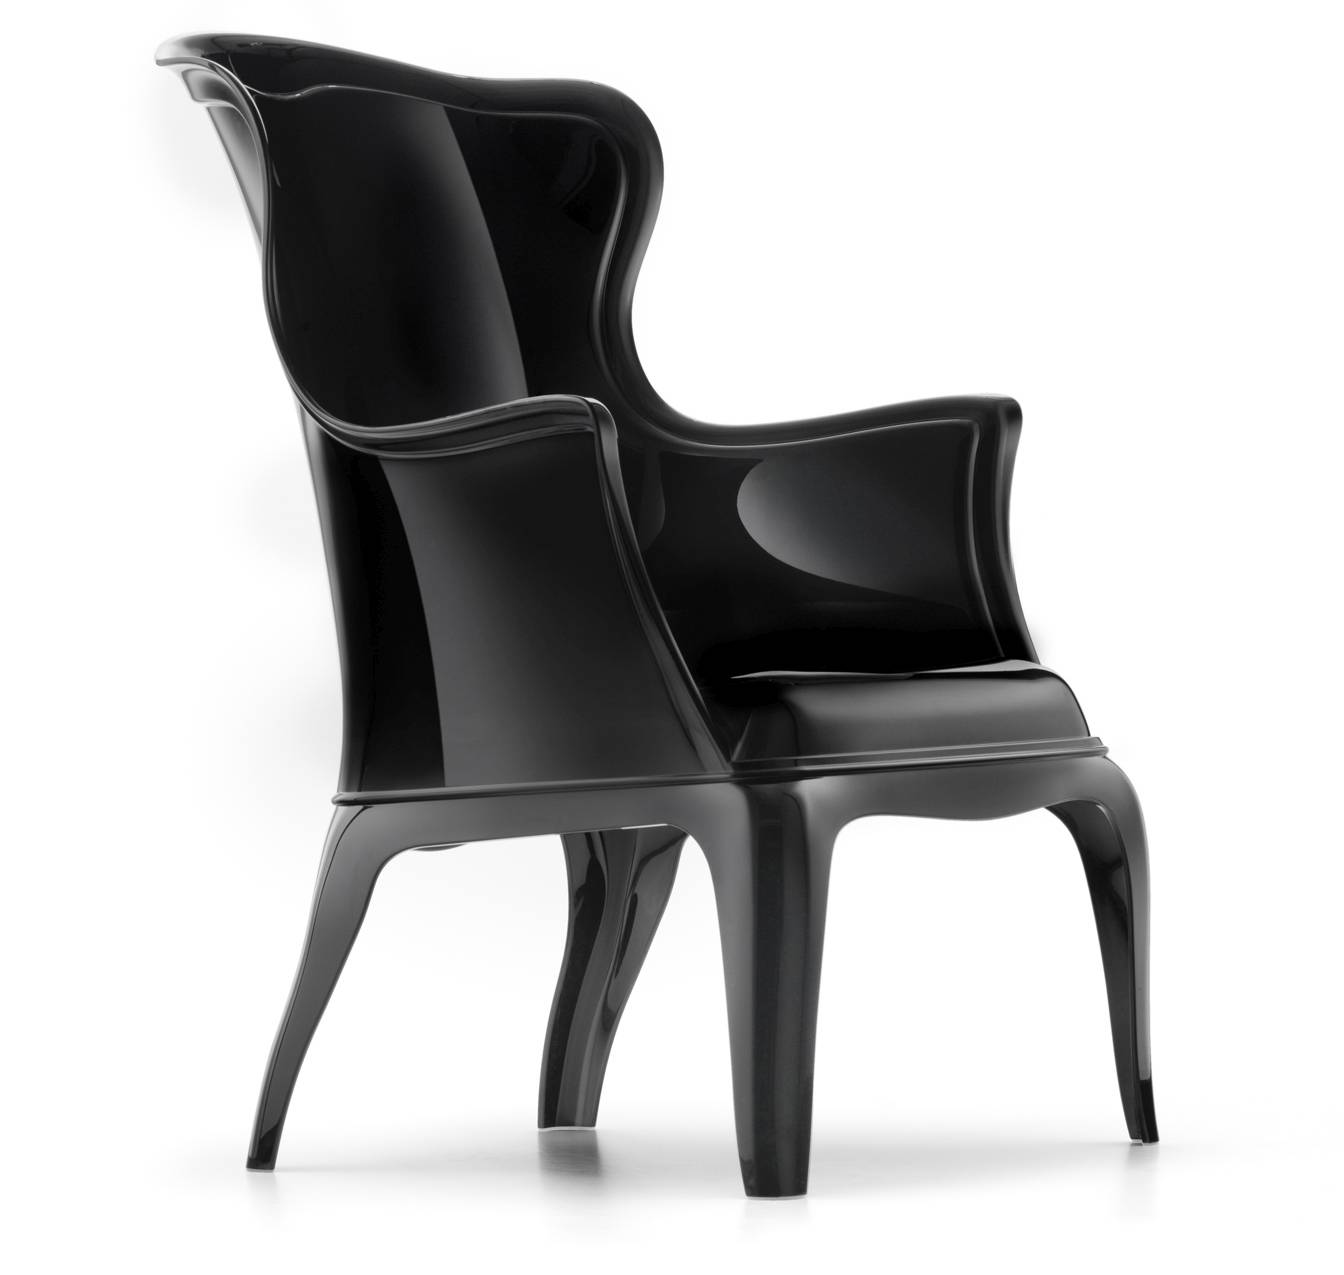 Fauteuil-design-Pasha-Pedrali-011